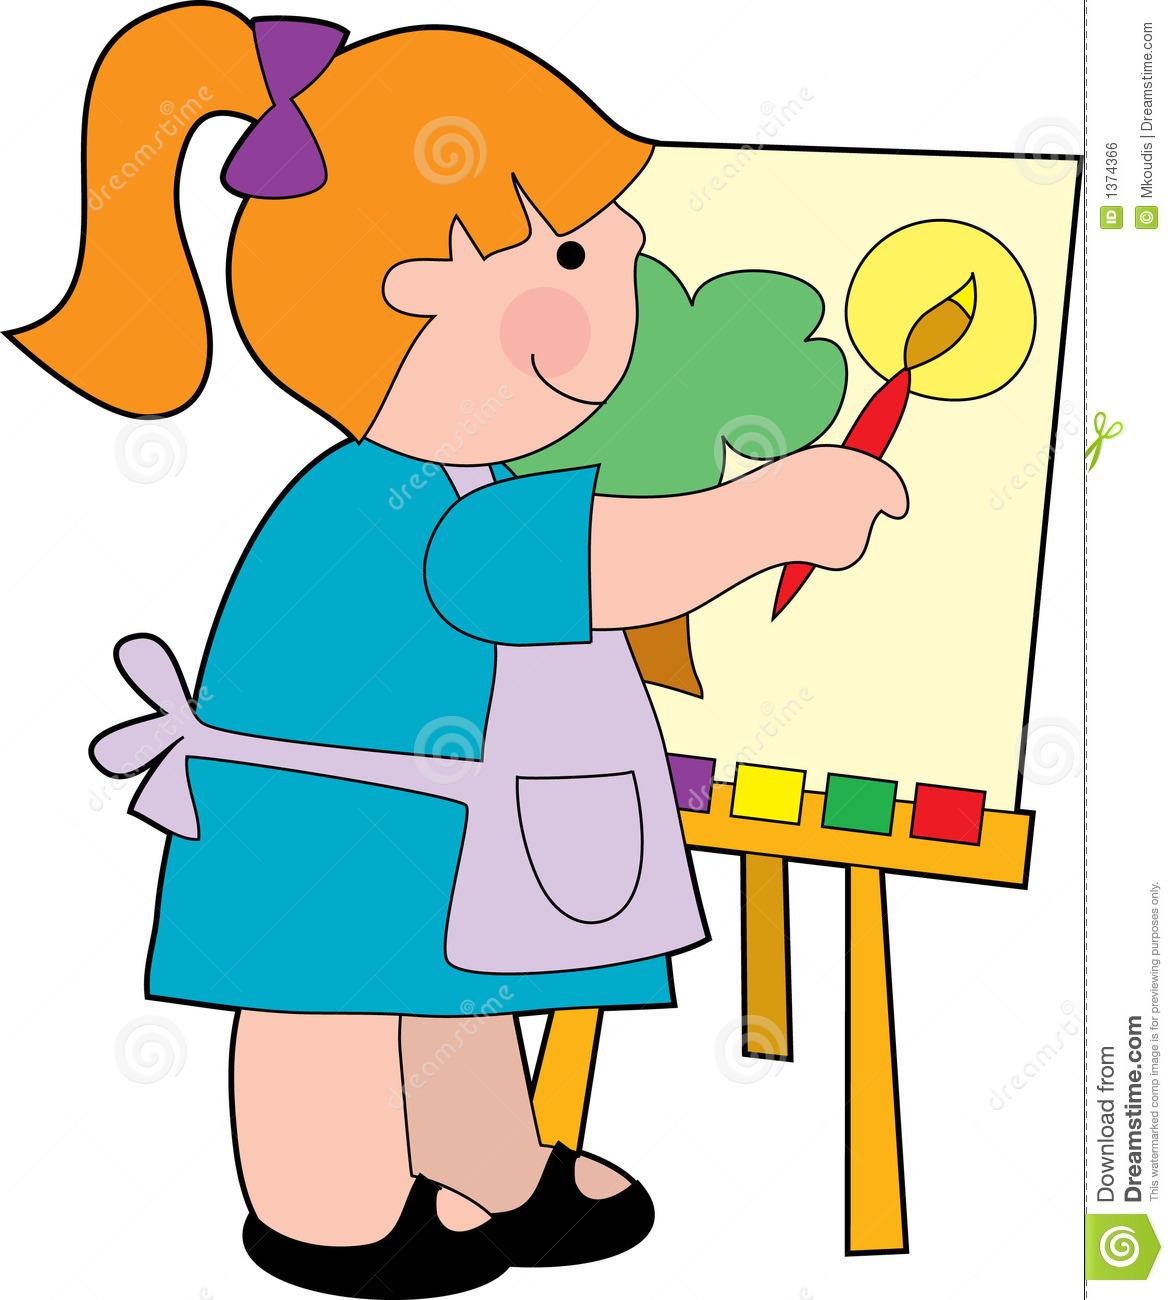 Paint Clipart For Kids-Paint clipart for kids-11